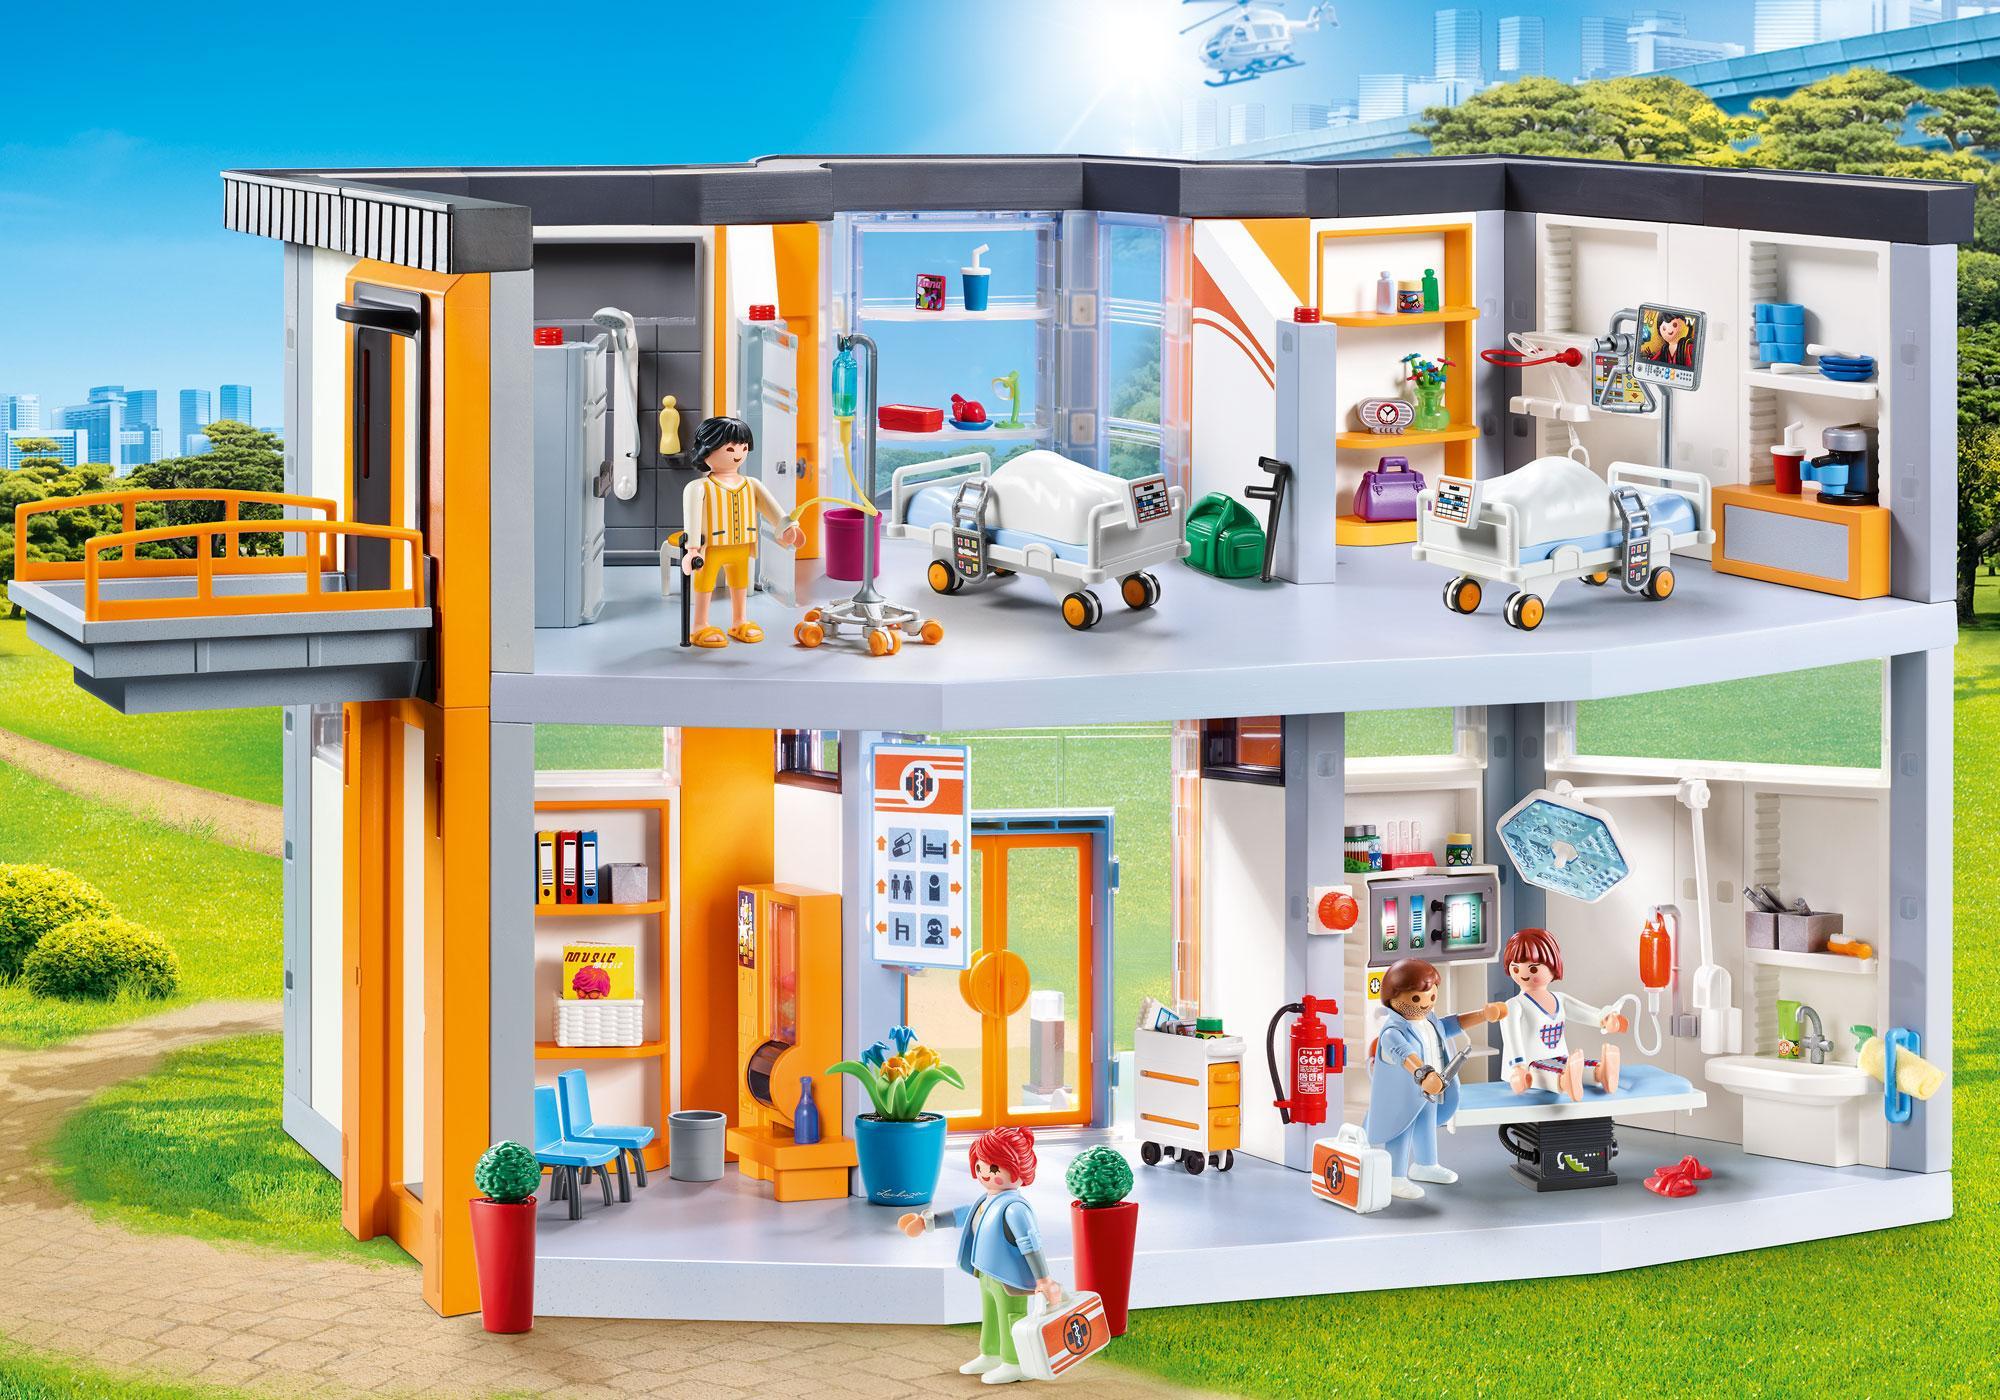 http://media.playmobil.com/i/playmobil/70190_product_detail/Großes Krankenhaus mit Einrichtung